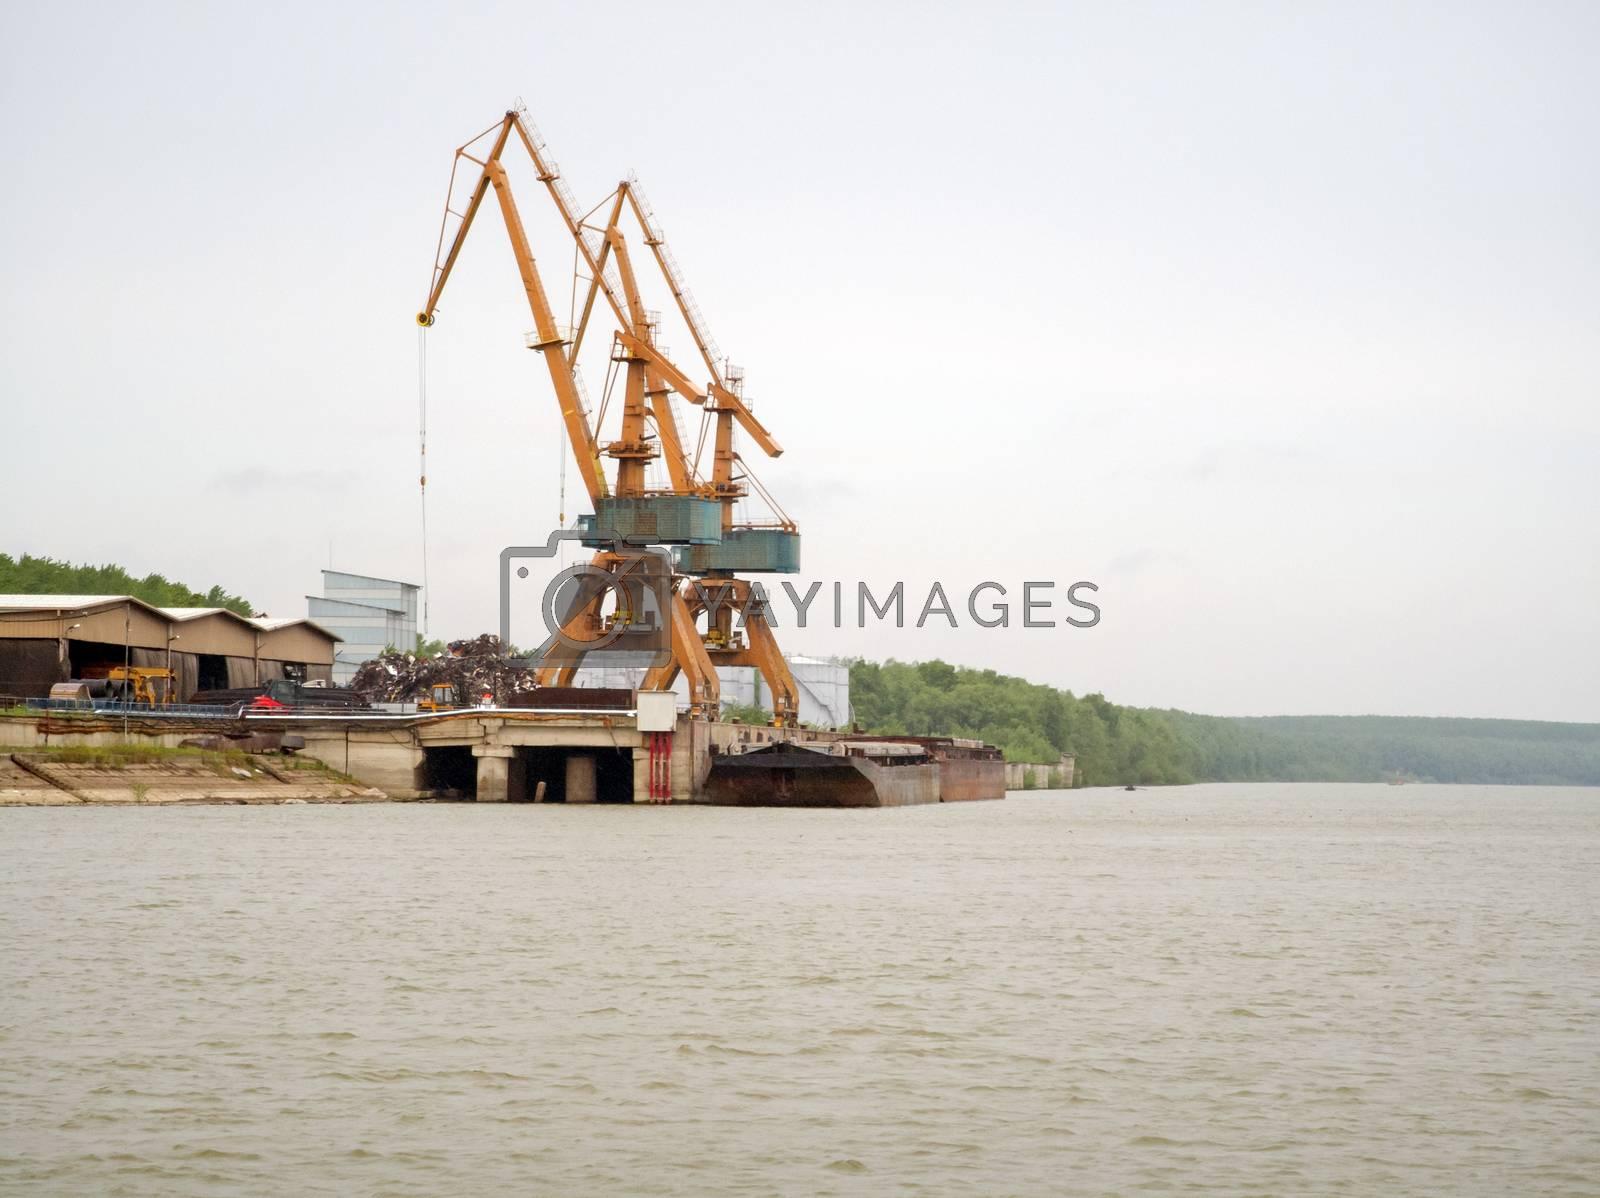 Harbour lifting crane for loading cargo ships on Danube river